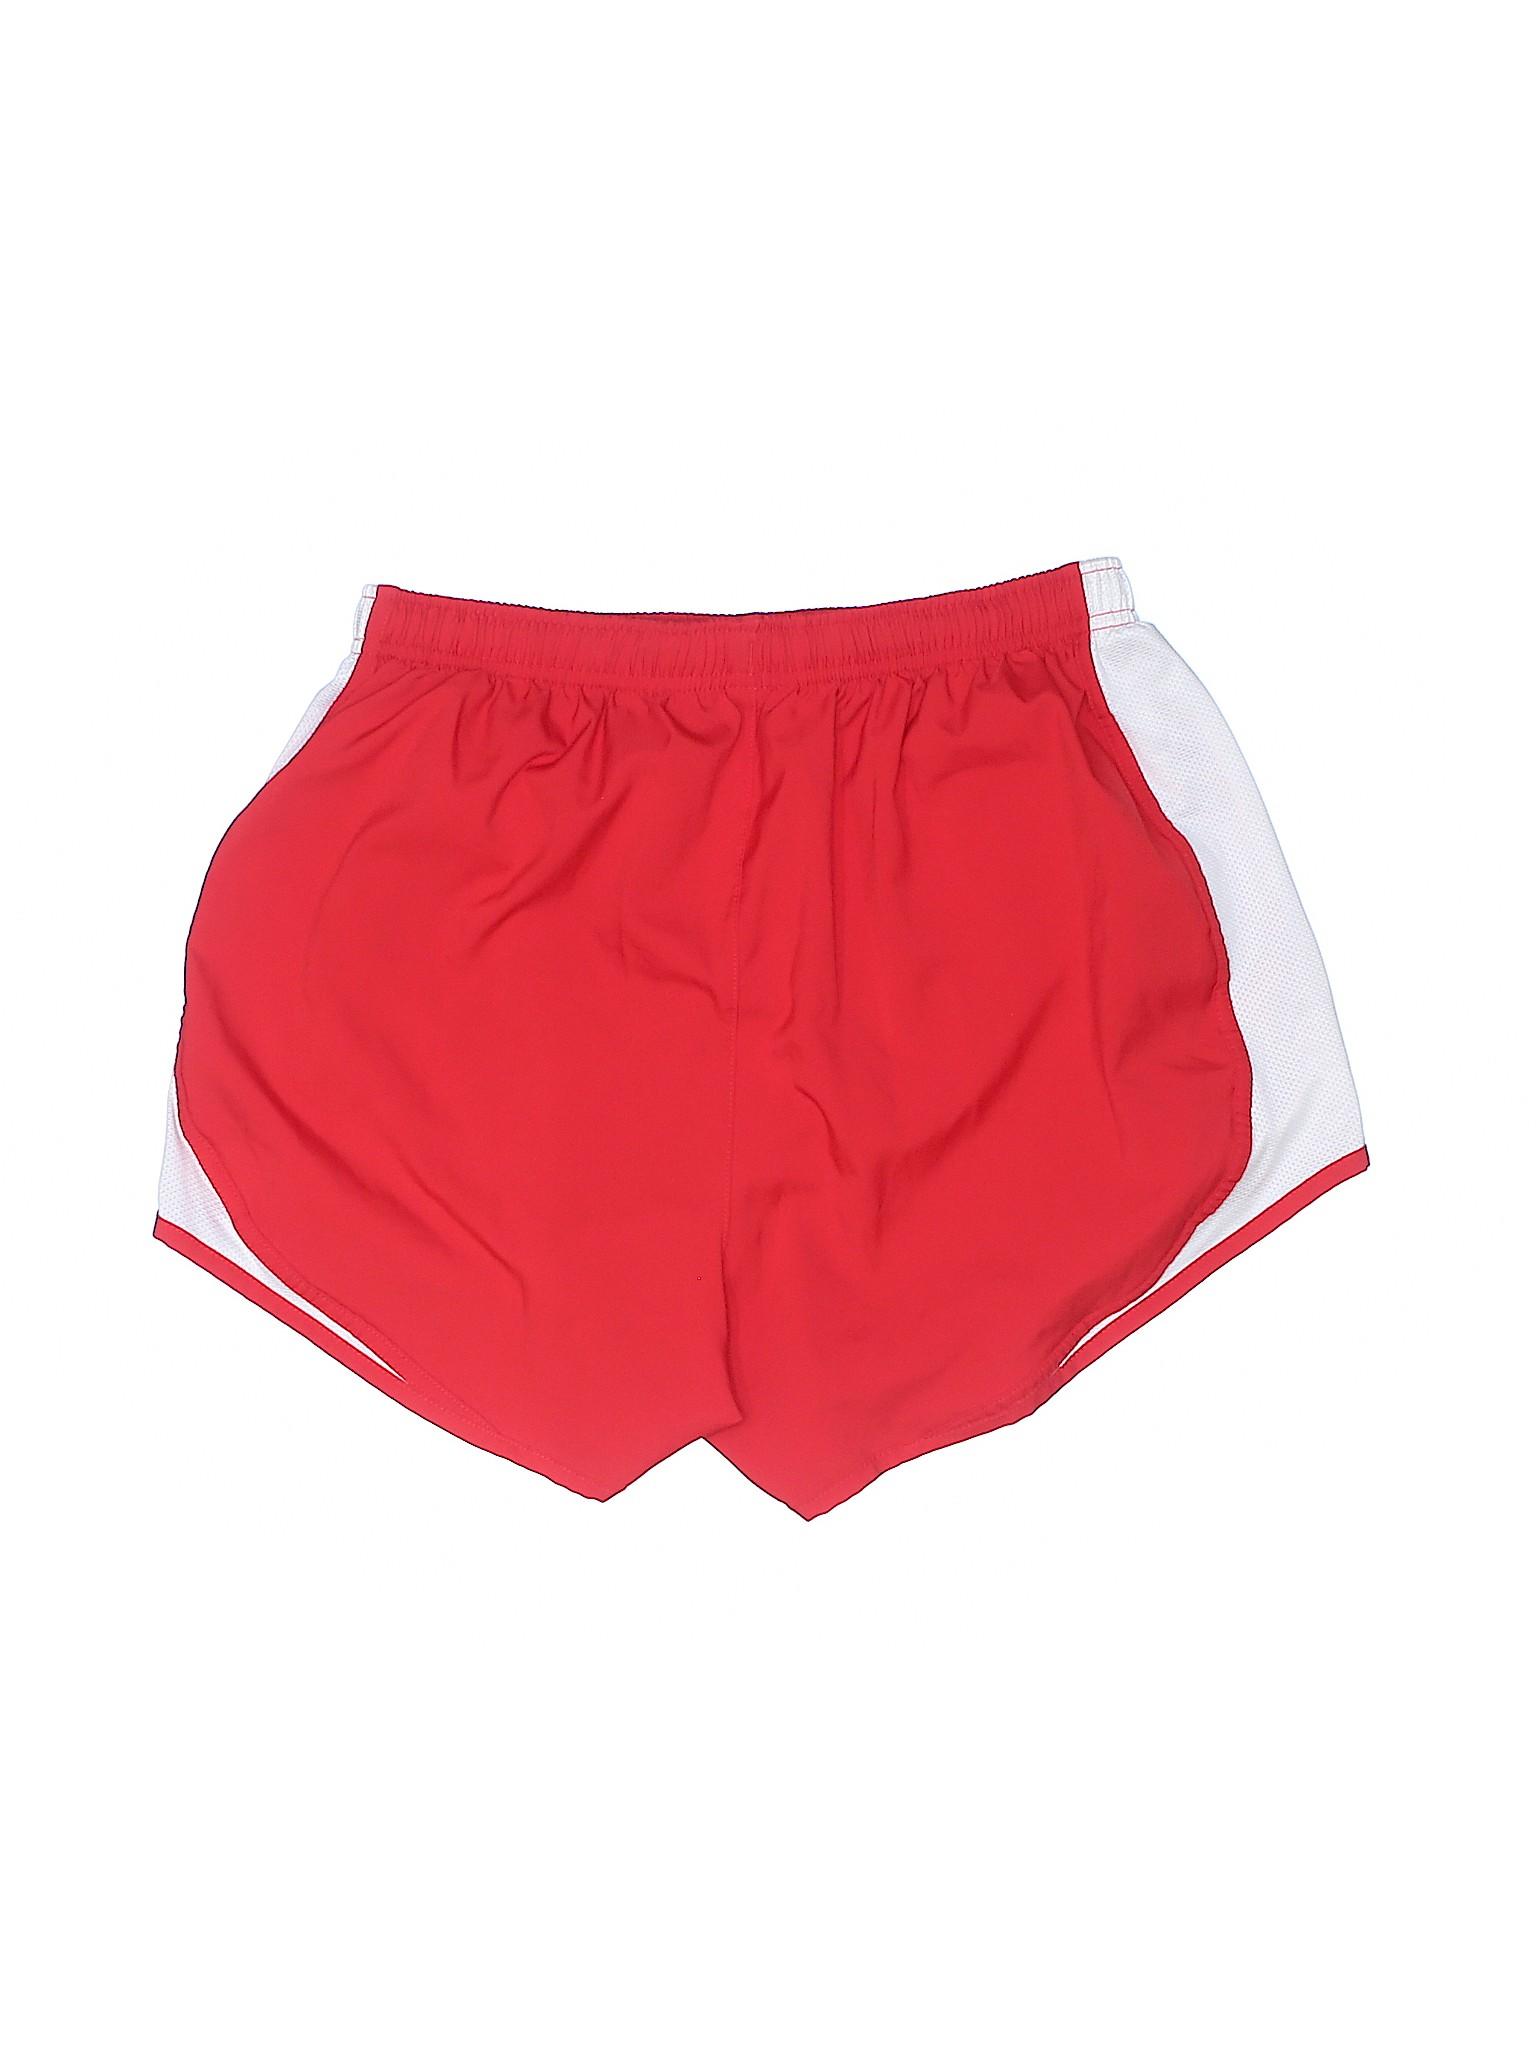 Athletic Nike Nike Shorts Boutique Boutique Nike Boutique Boutique Athletic Shorts Shorts Nike Athletic Shorts Athletic nZTwxOAq